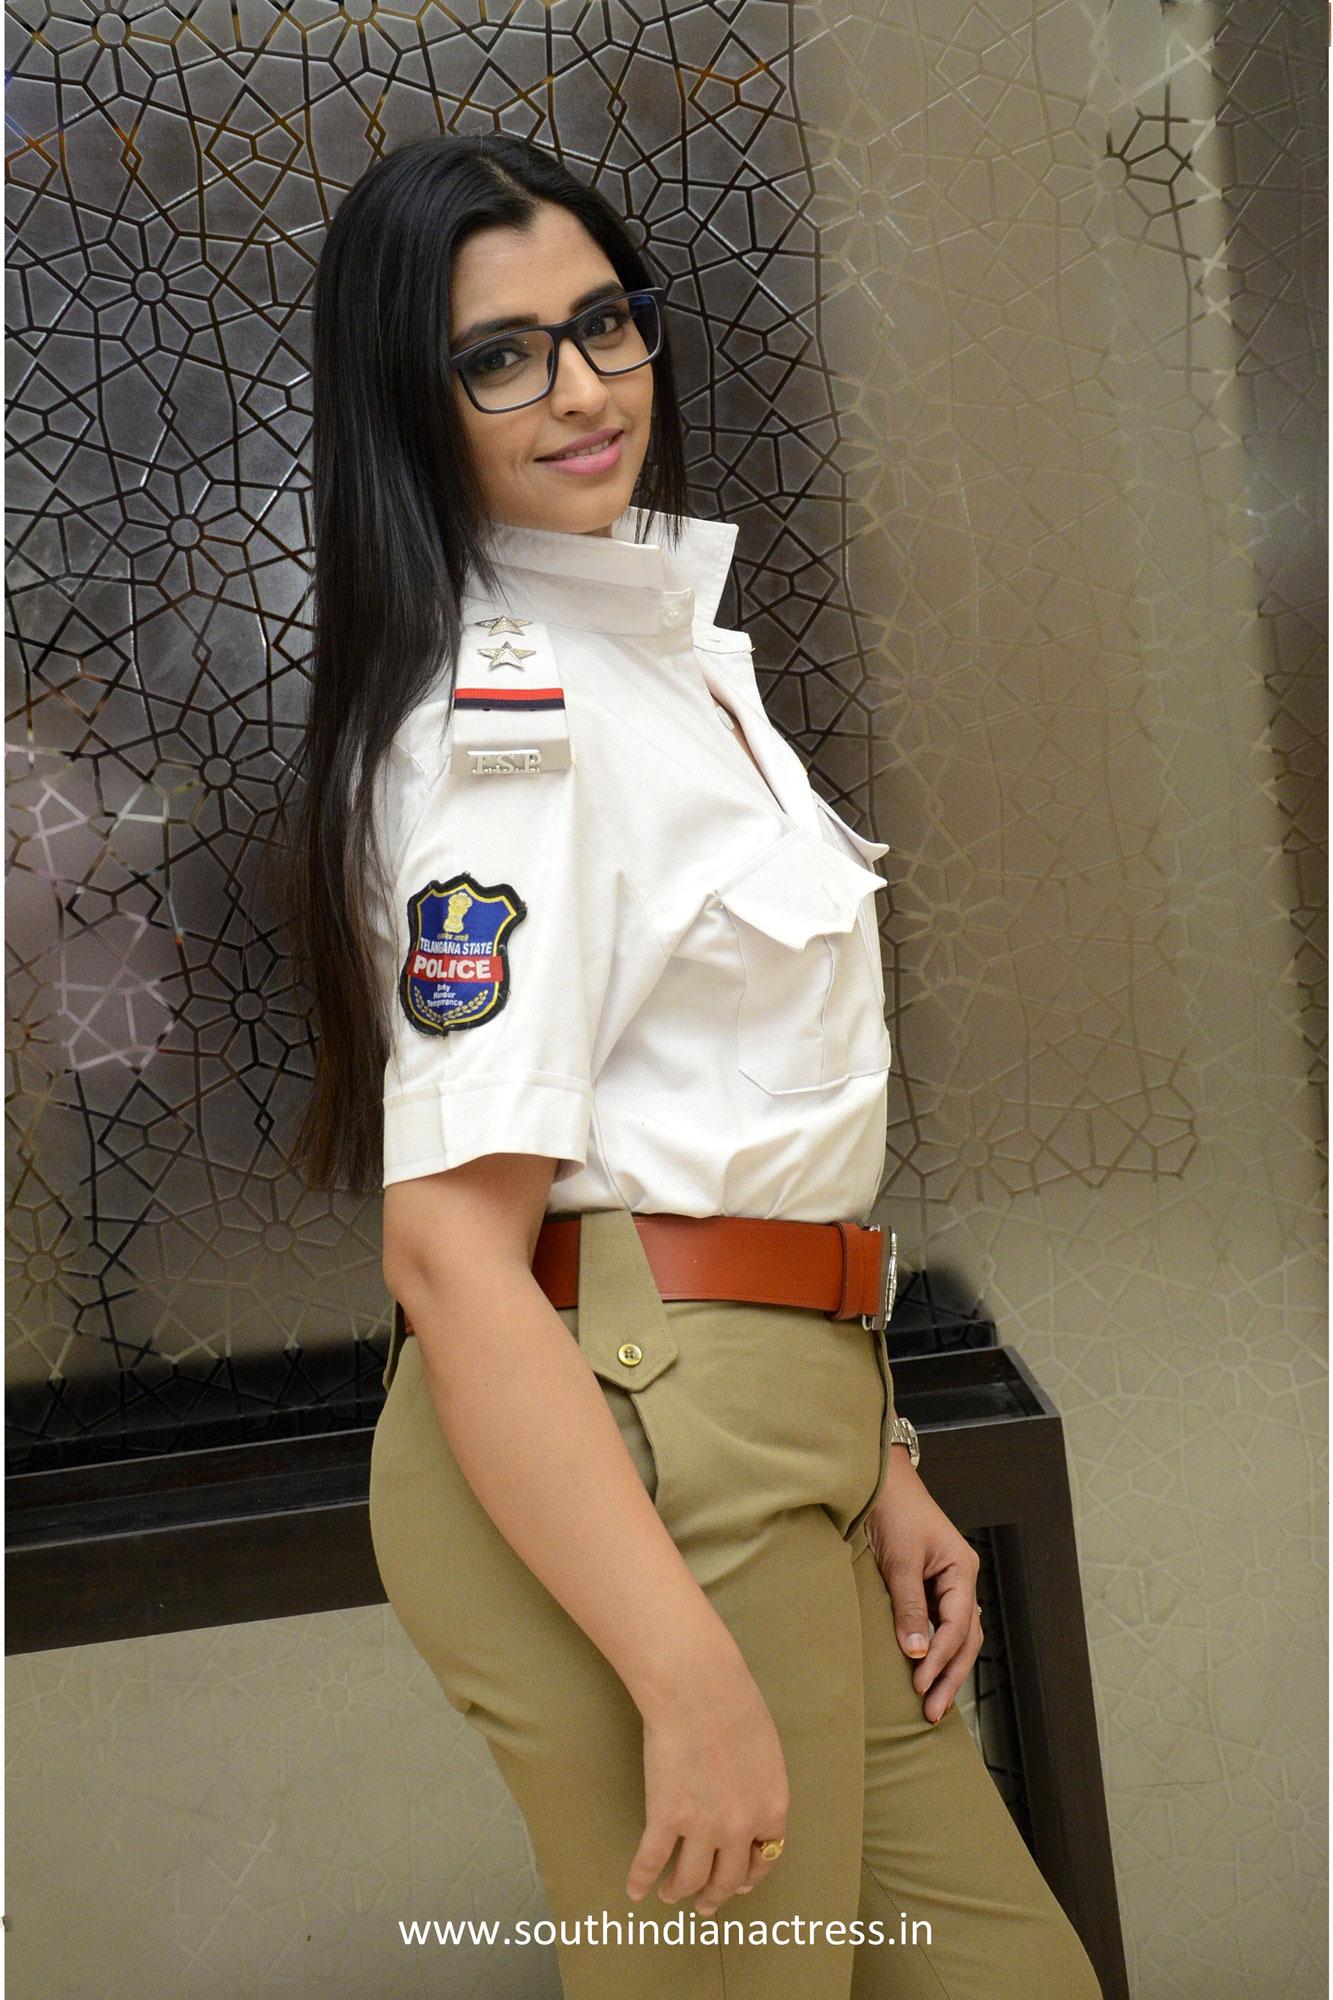 Syamala Anchor Bomb Pics in Lady Police Dress - Latest